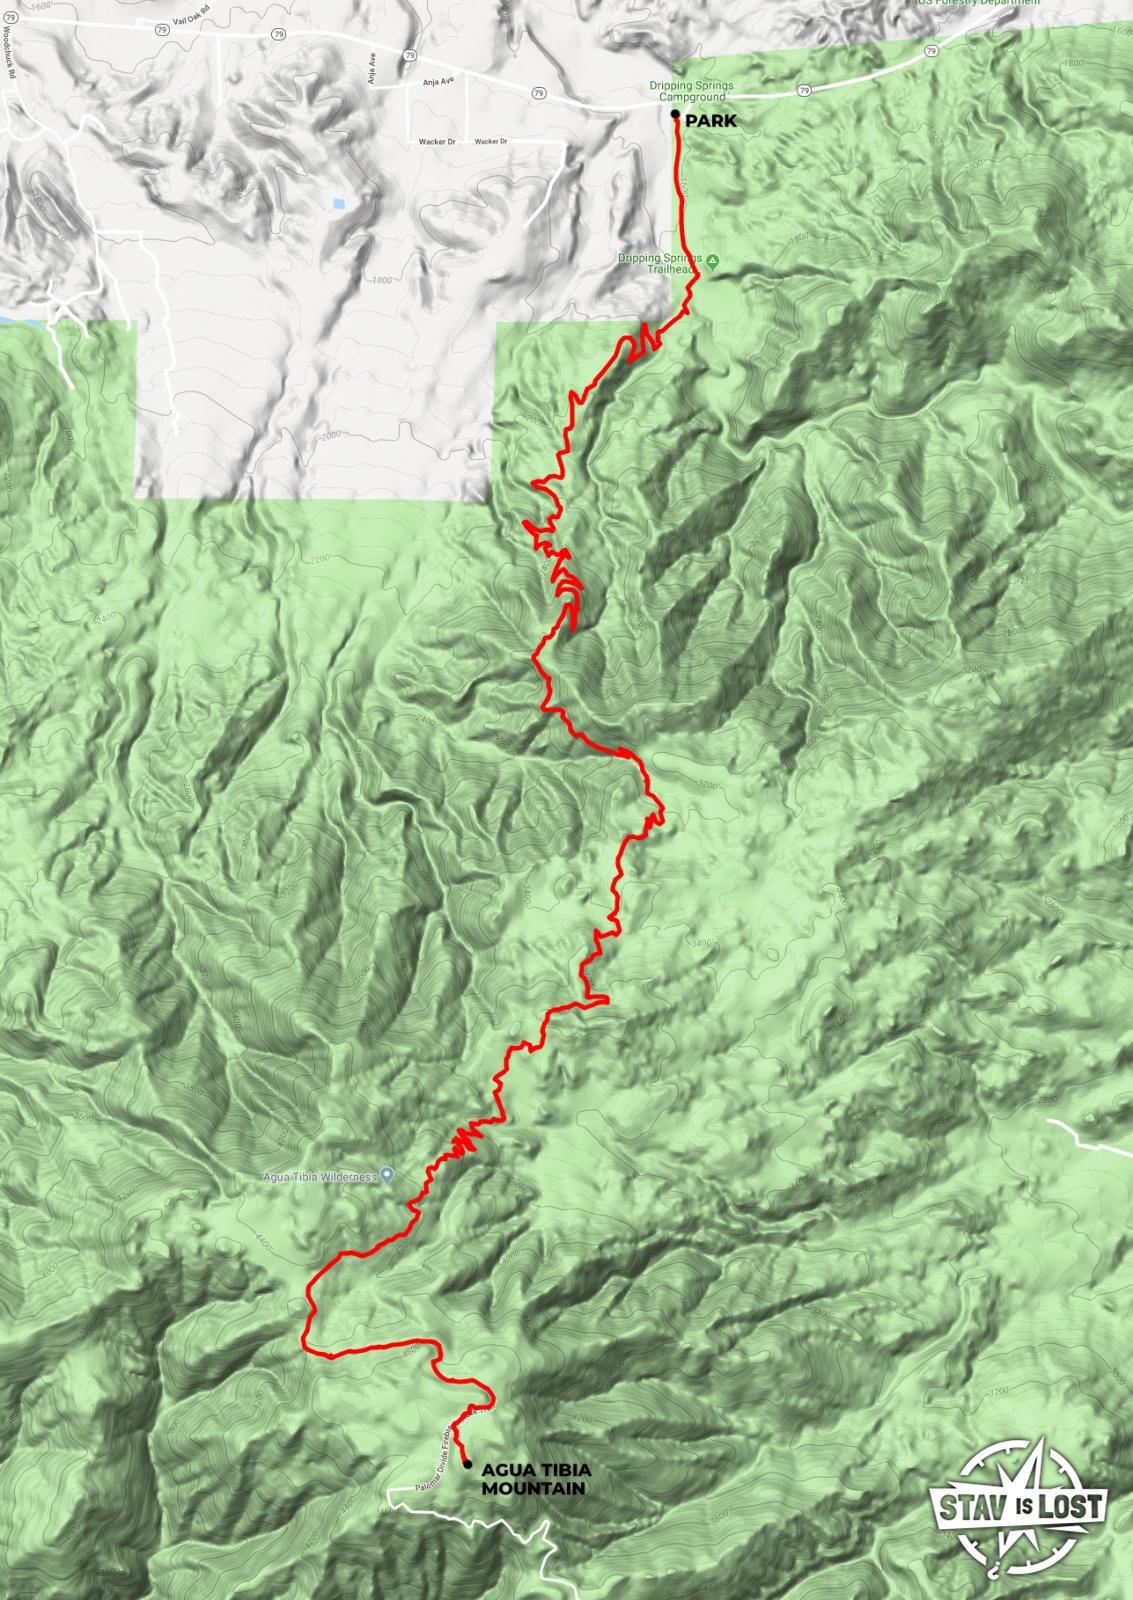 Hiking Agua Tibia Mountain via Dripping Springs Trail in